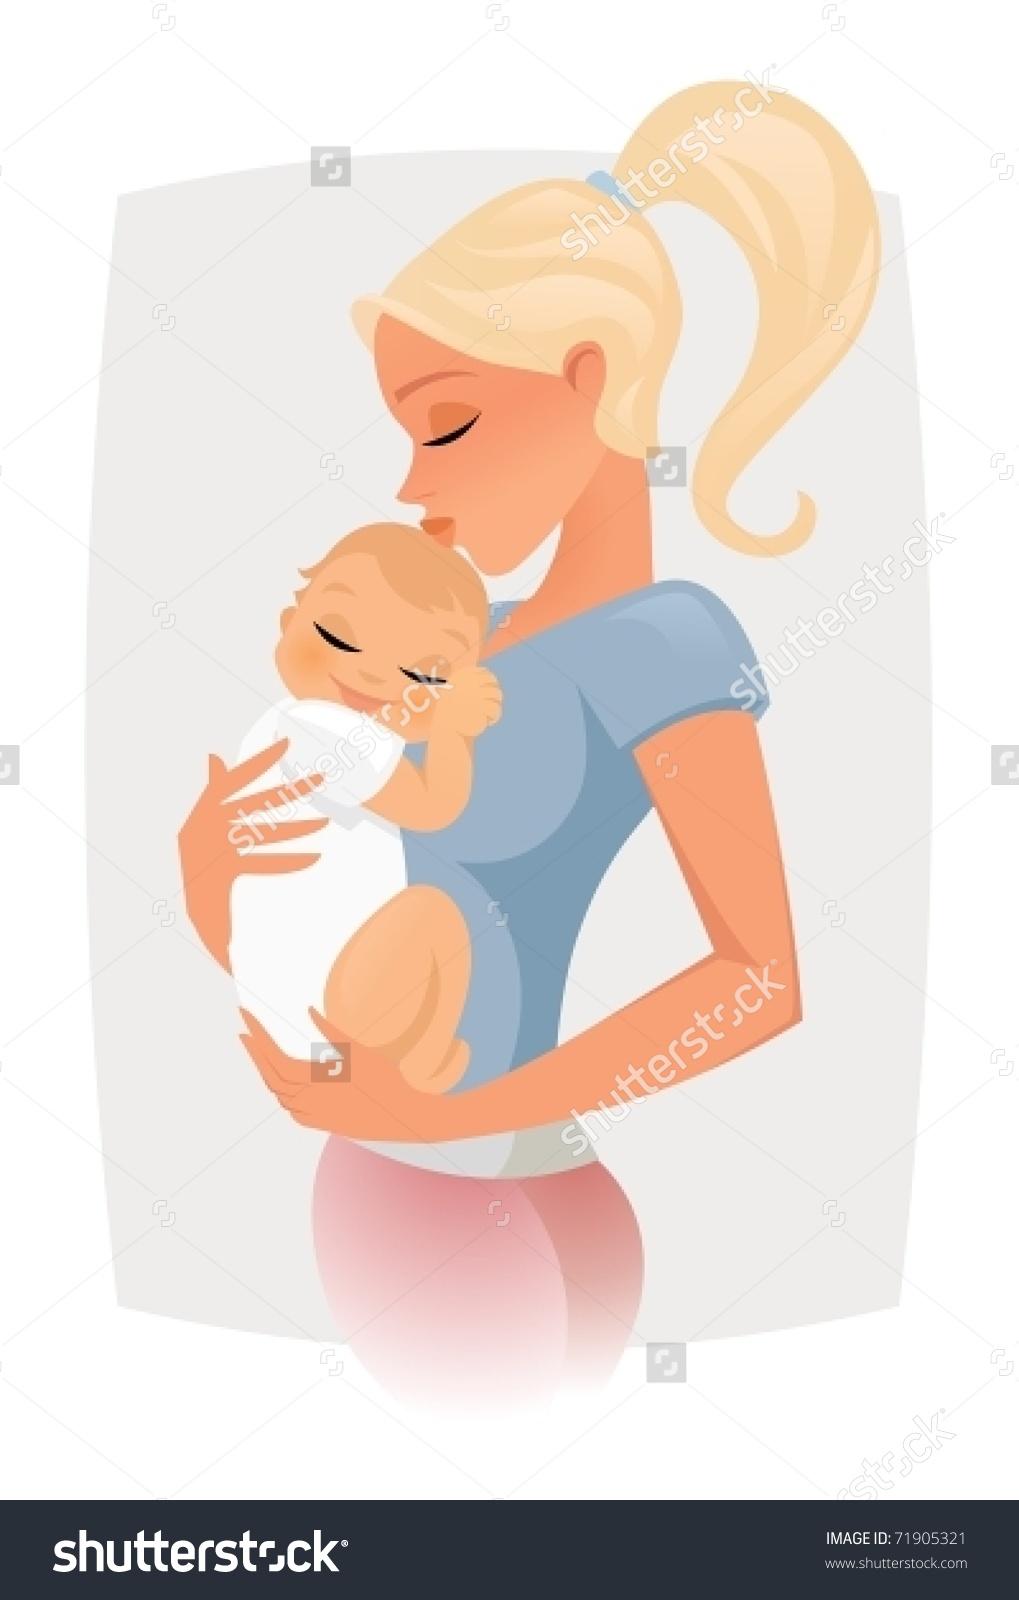 Mom Hugs Kiss Her Baby Stock Vector 71905321.